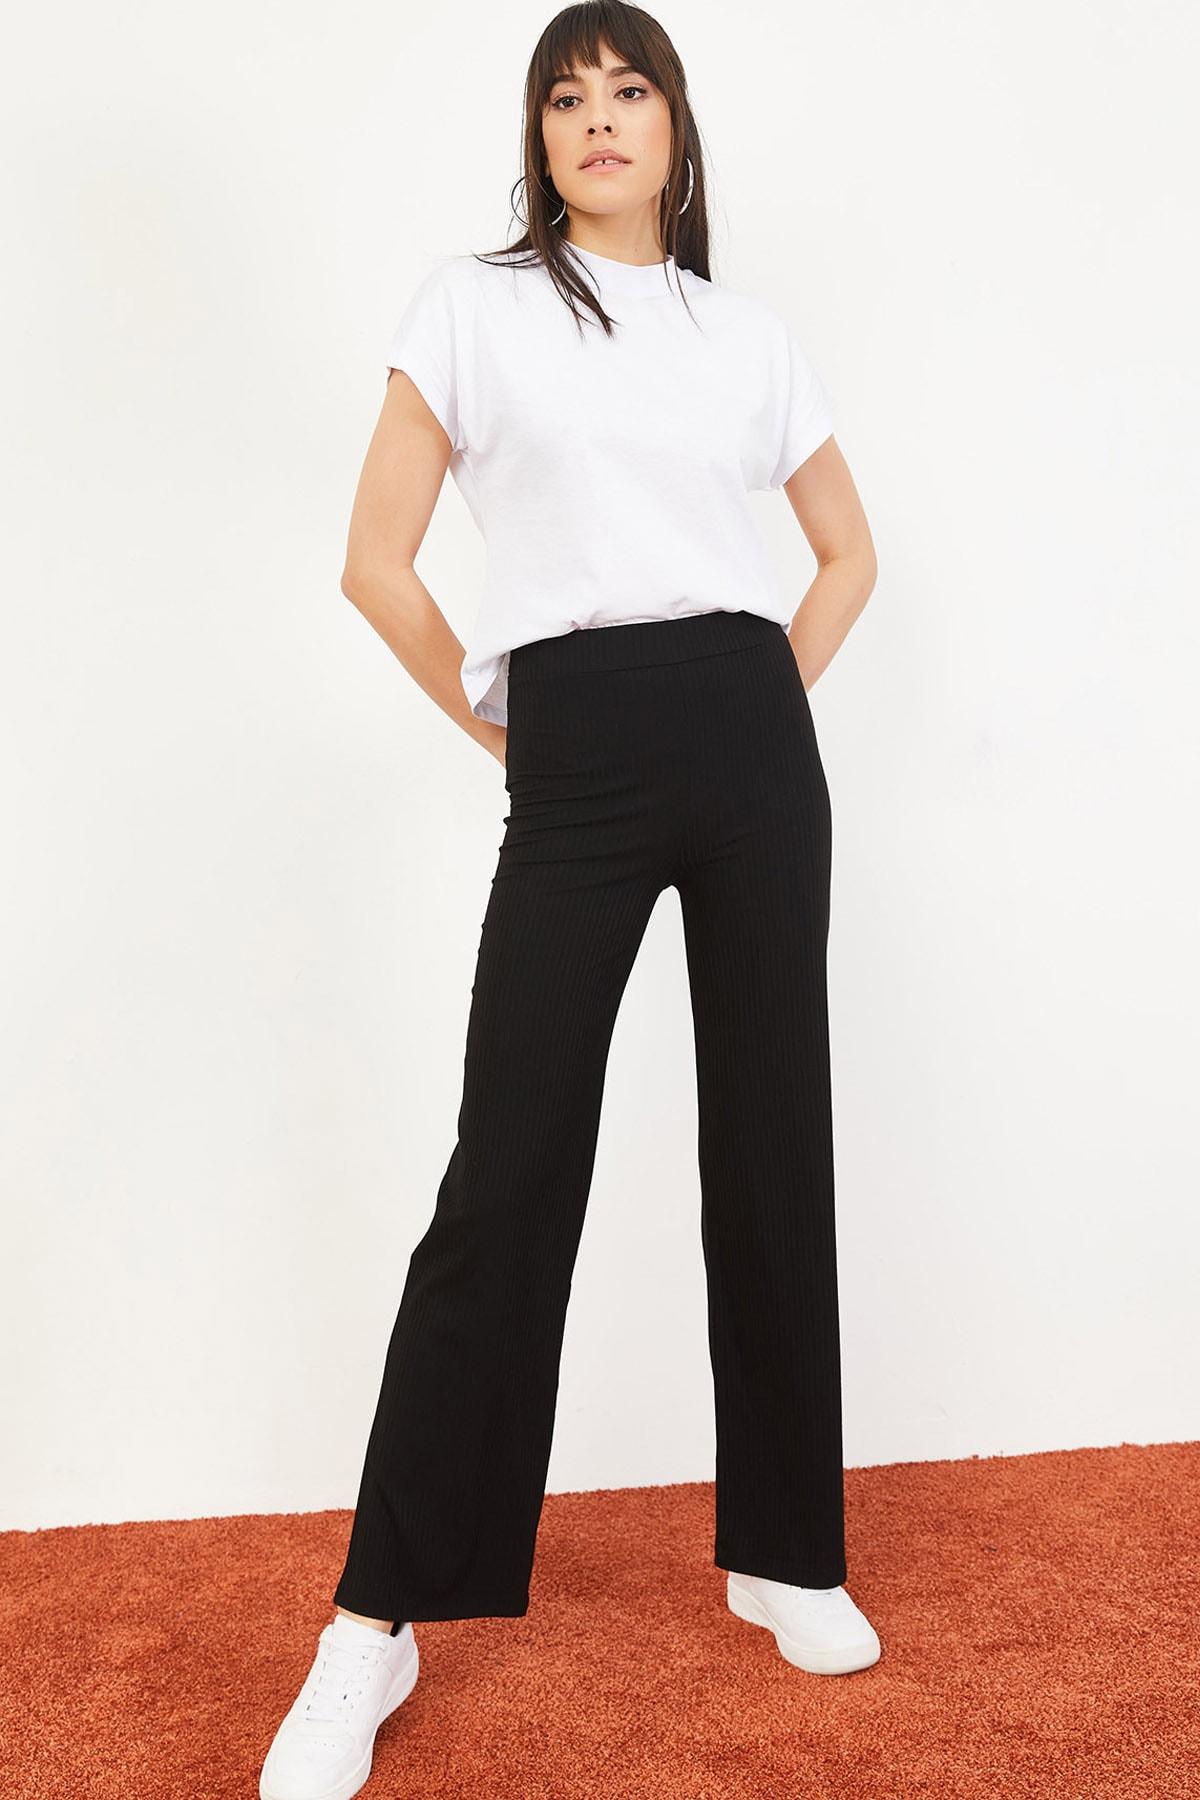 Bianco Lucci Kadın Siyah İspanyol Paça Beli Lastikli Rahat Pantolon 10051020